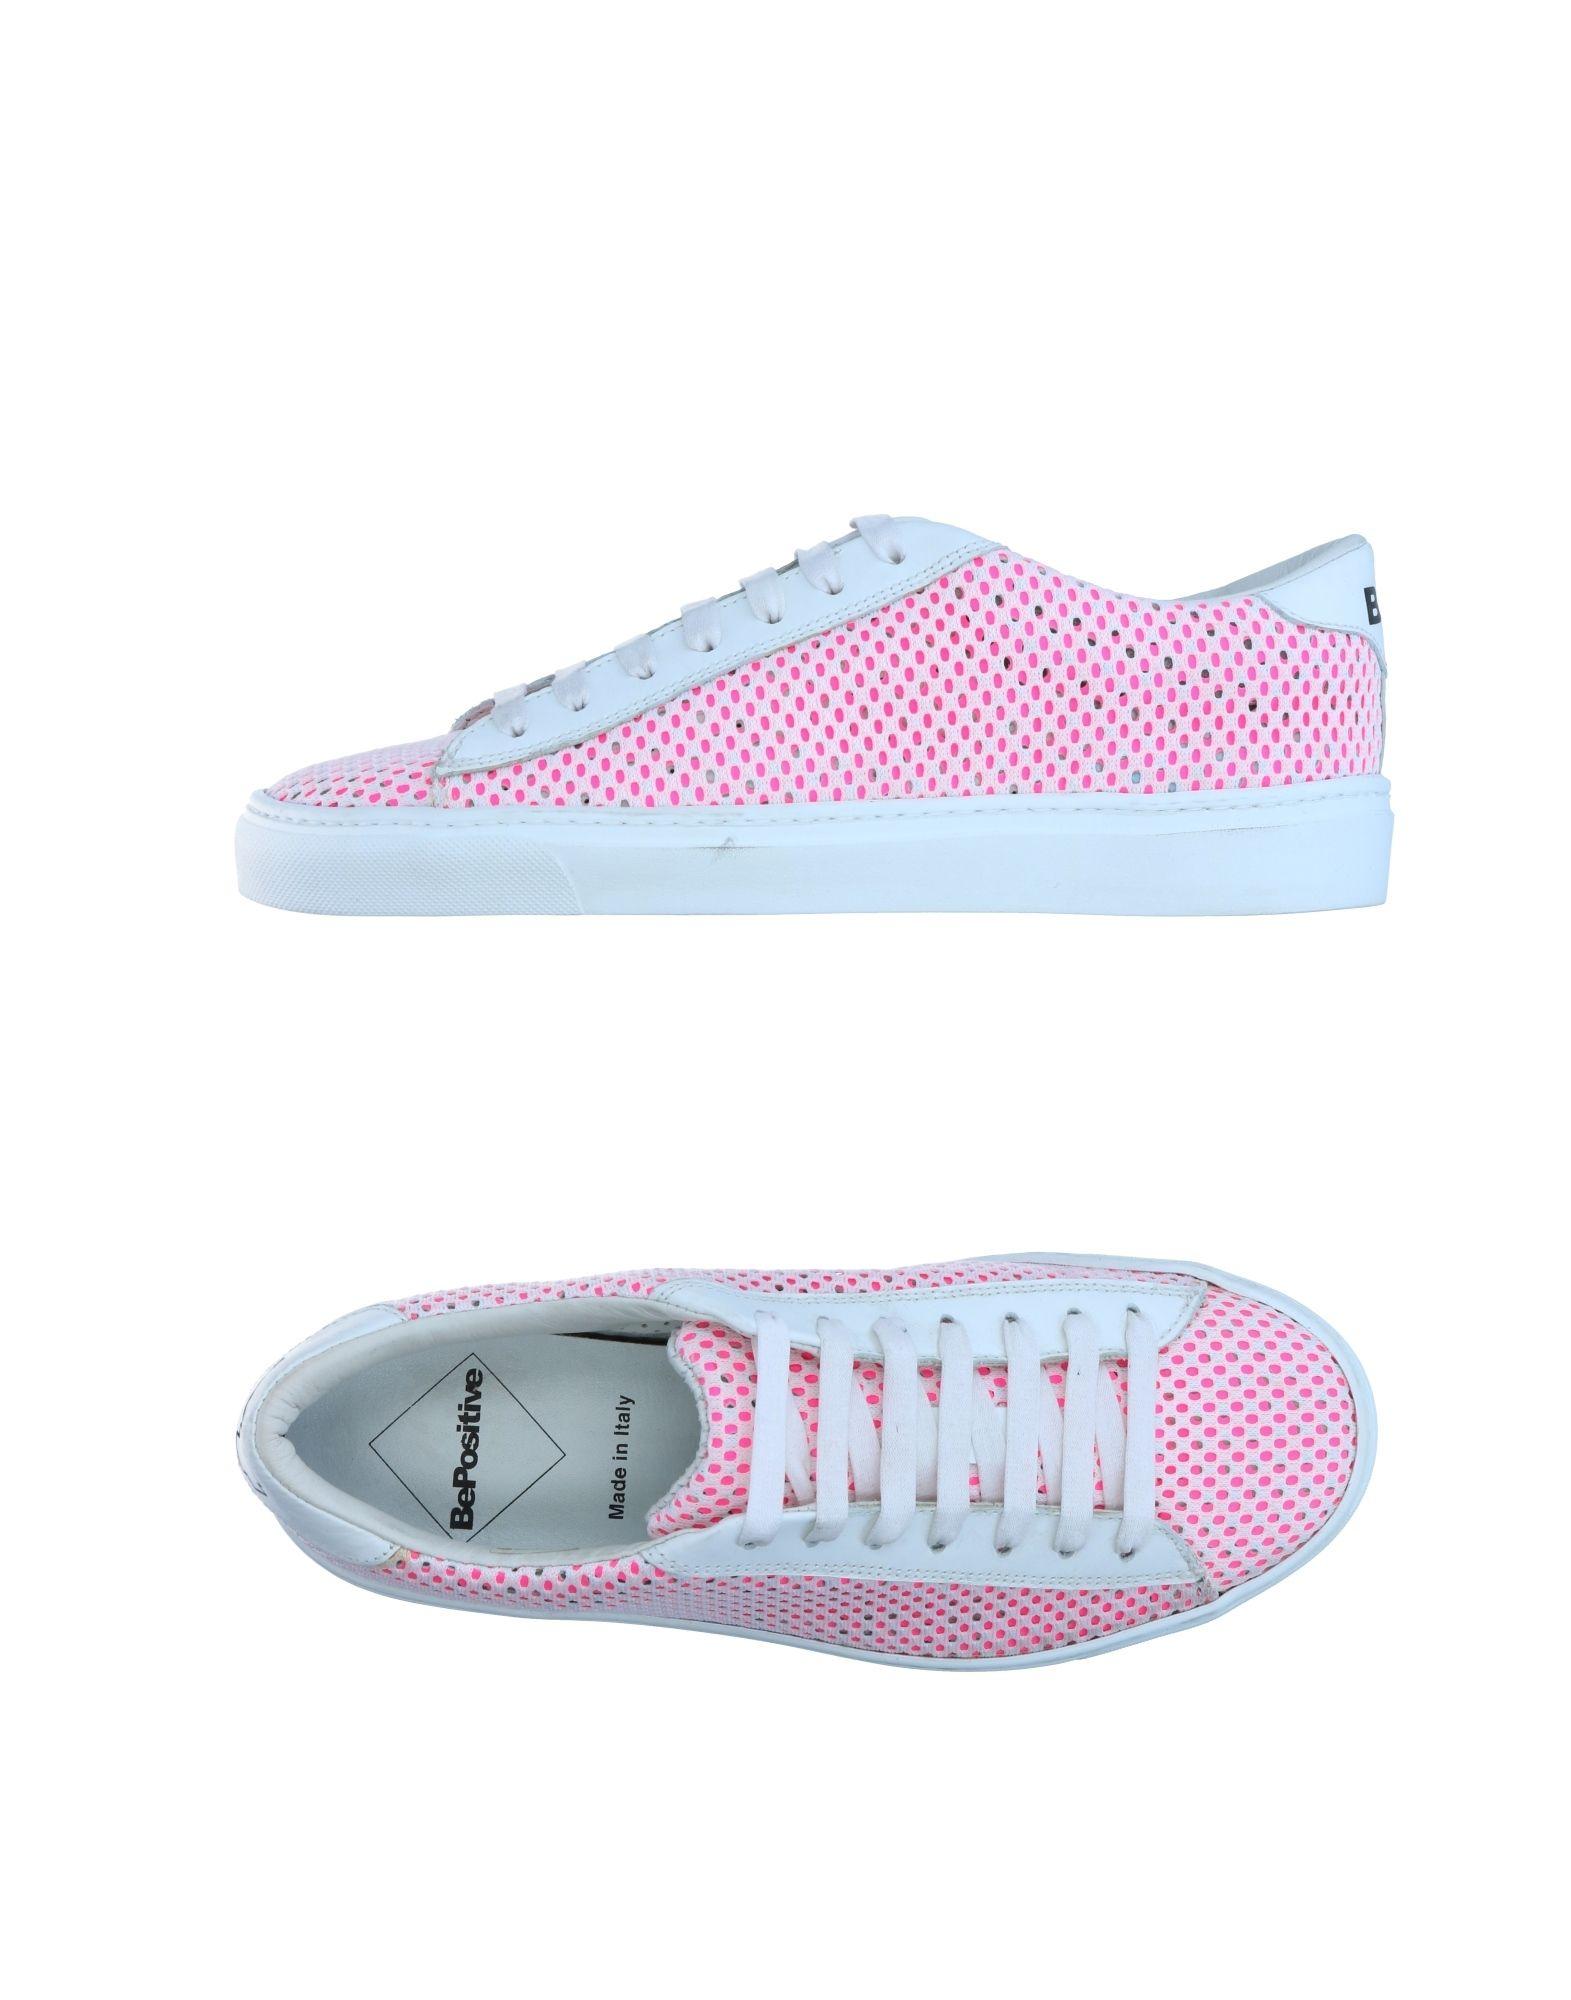 Bepositive Sneakers - Women Bepositive Sneakers online on    United Kingdom - 11236407PU fa4e2d